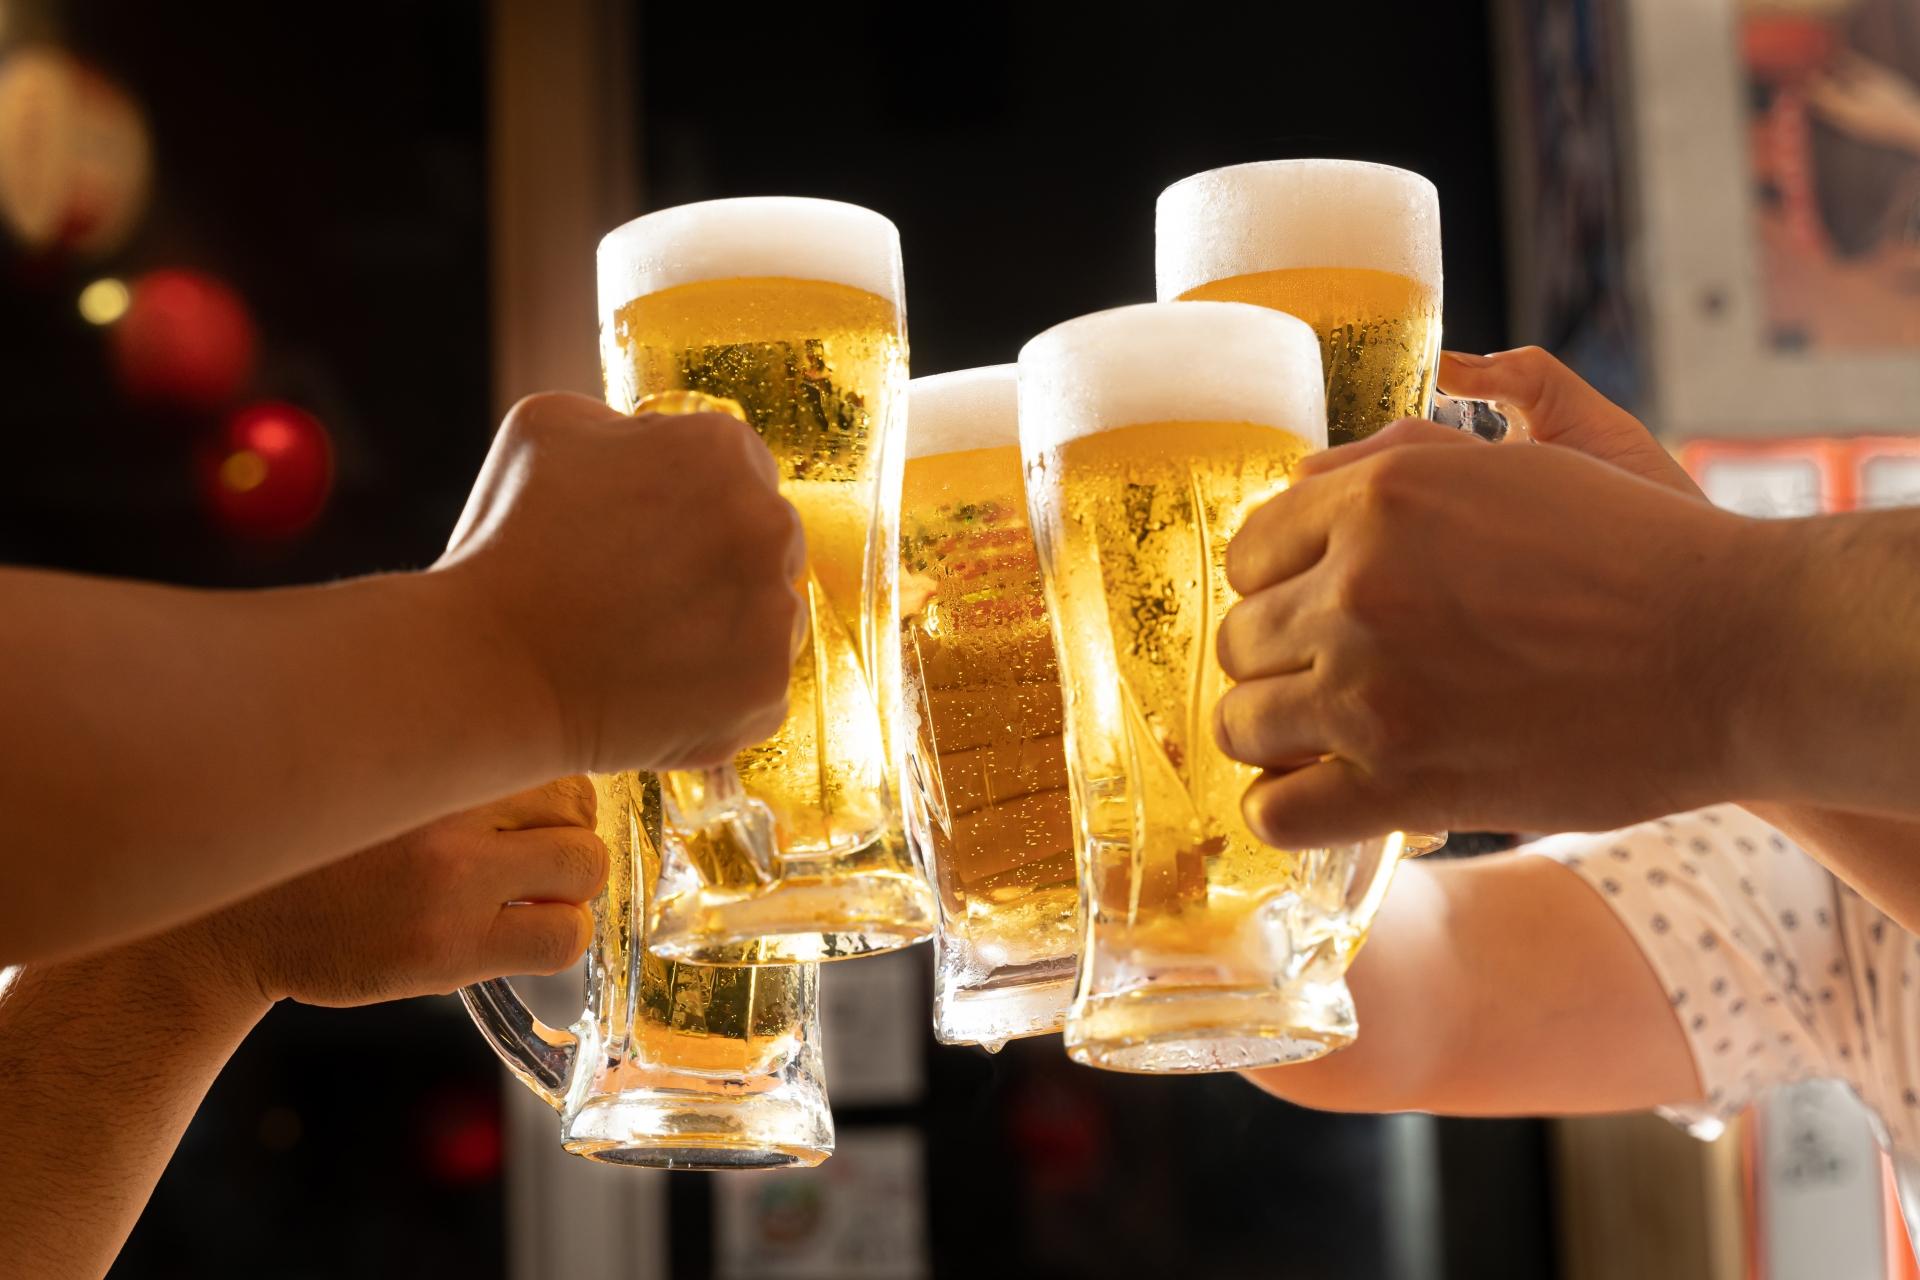 drunk-image